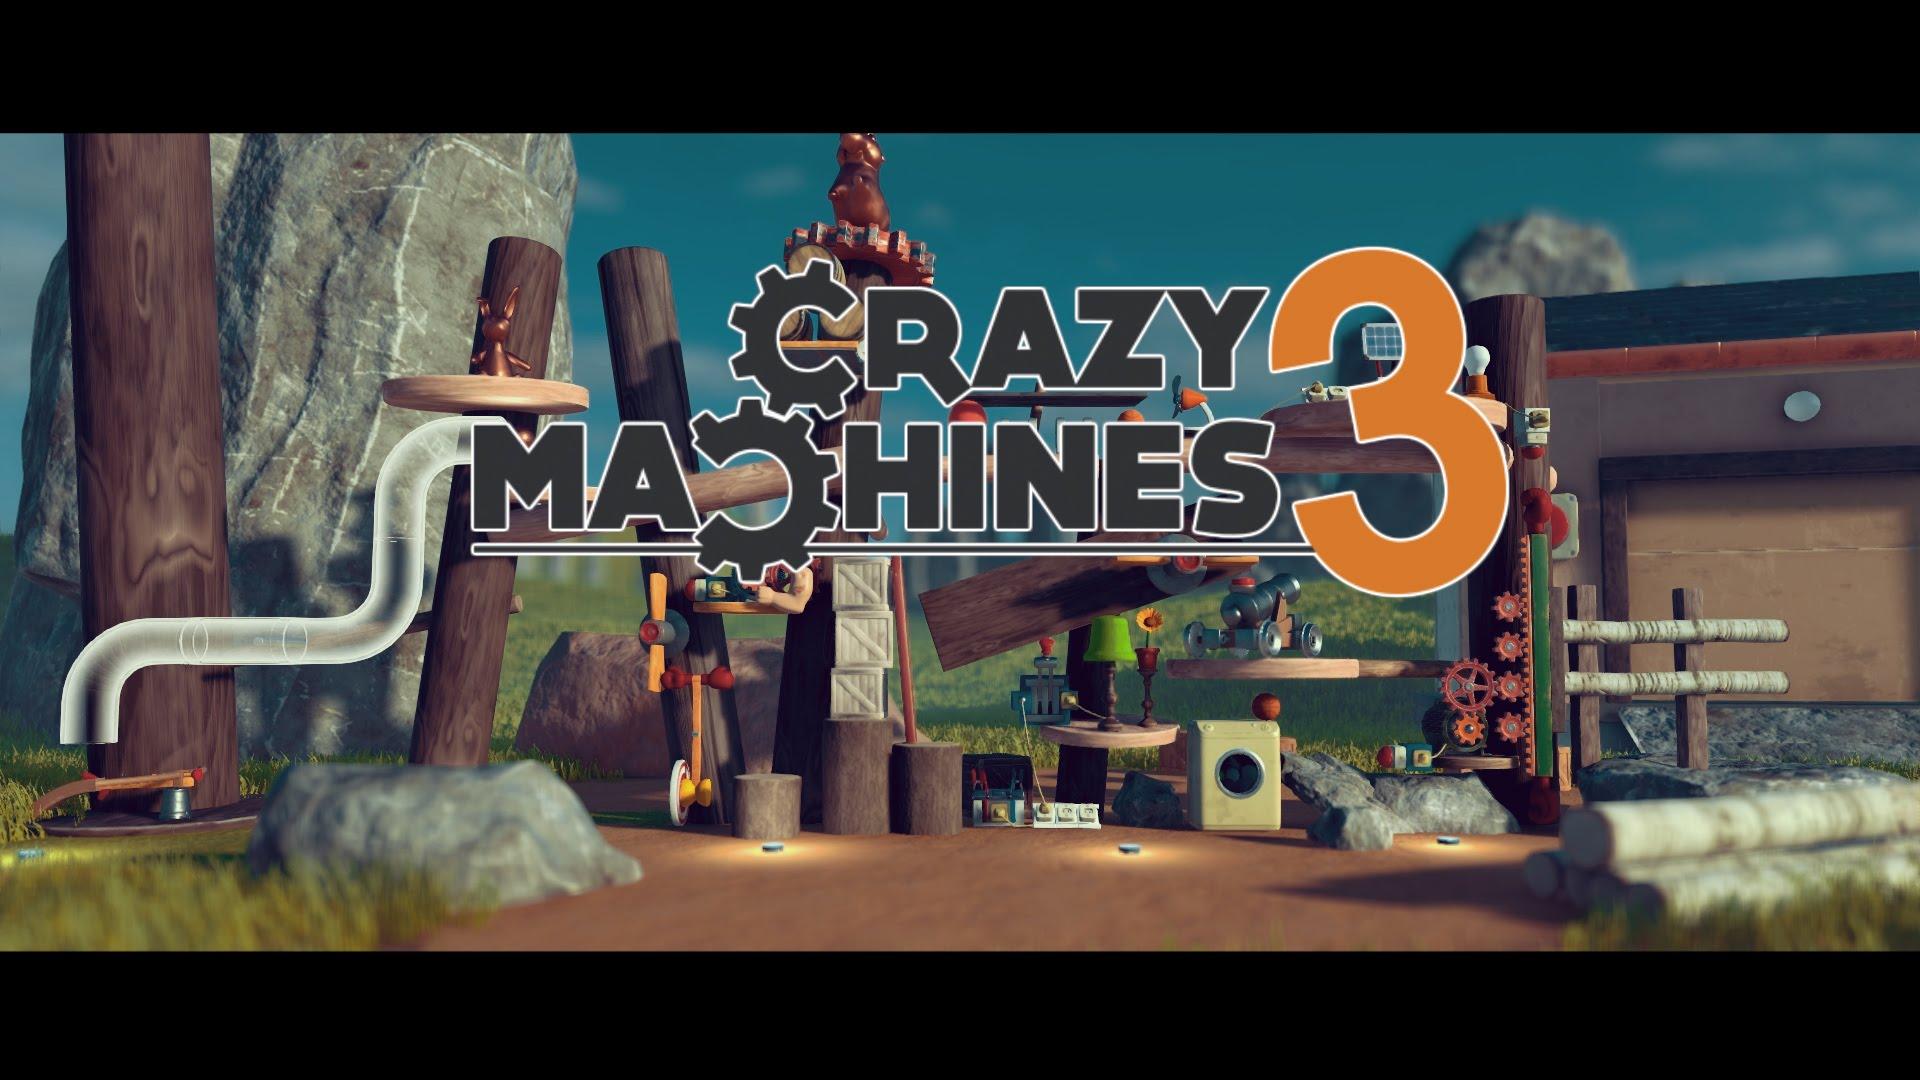 Crazy Machines Teaser verrät Release-Datum